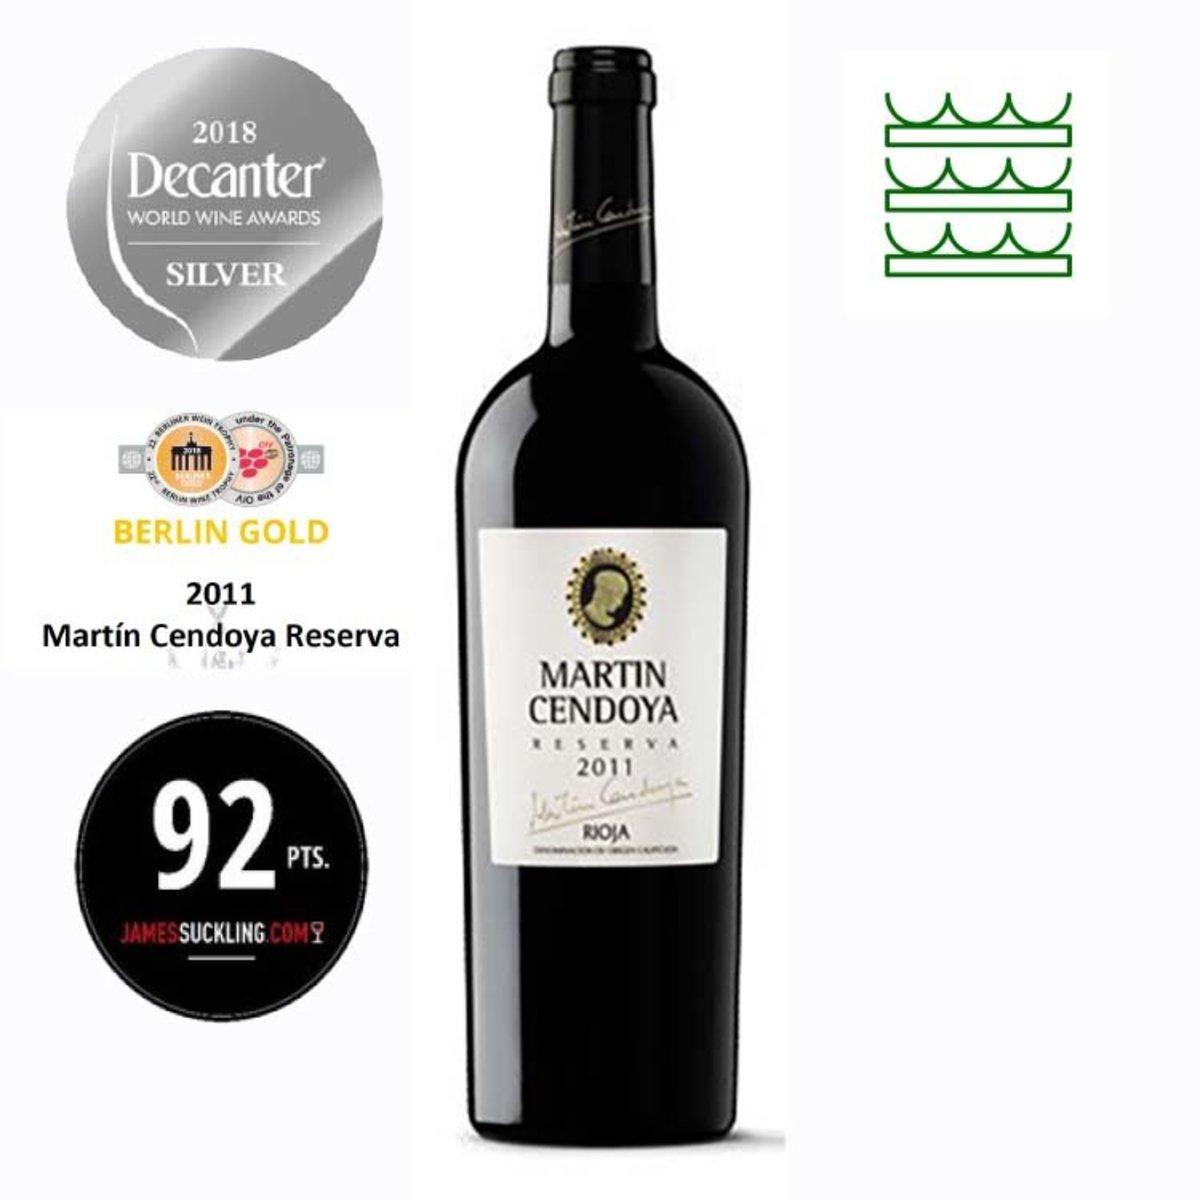 Decanter銀獎西班牙紅酒里奧哈 Martin Reserva 2011